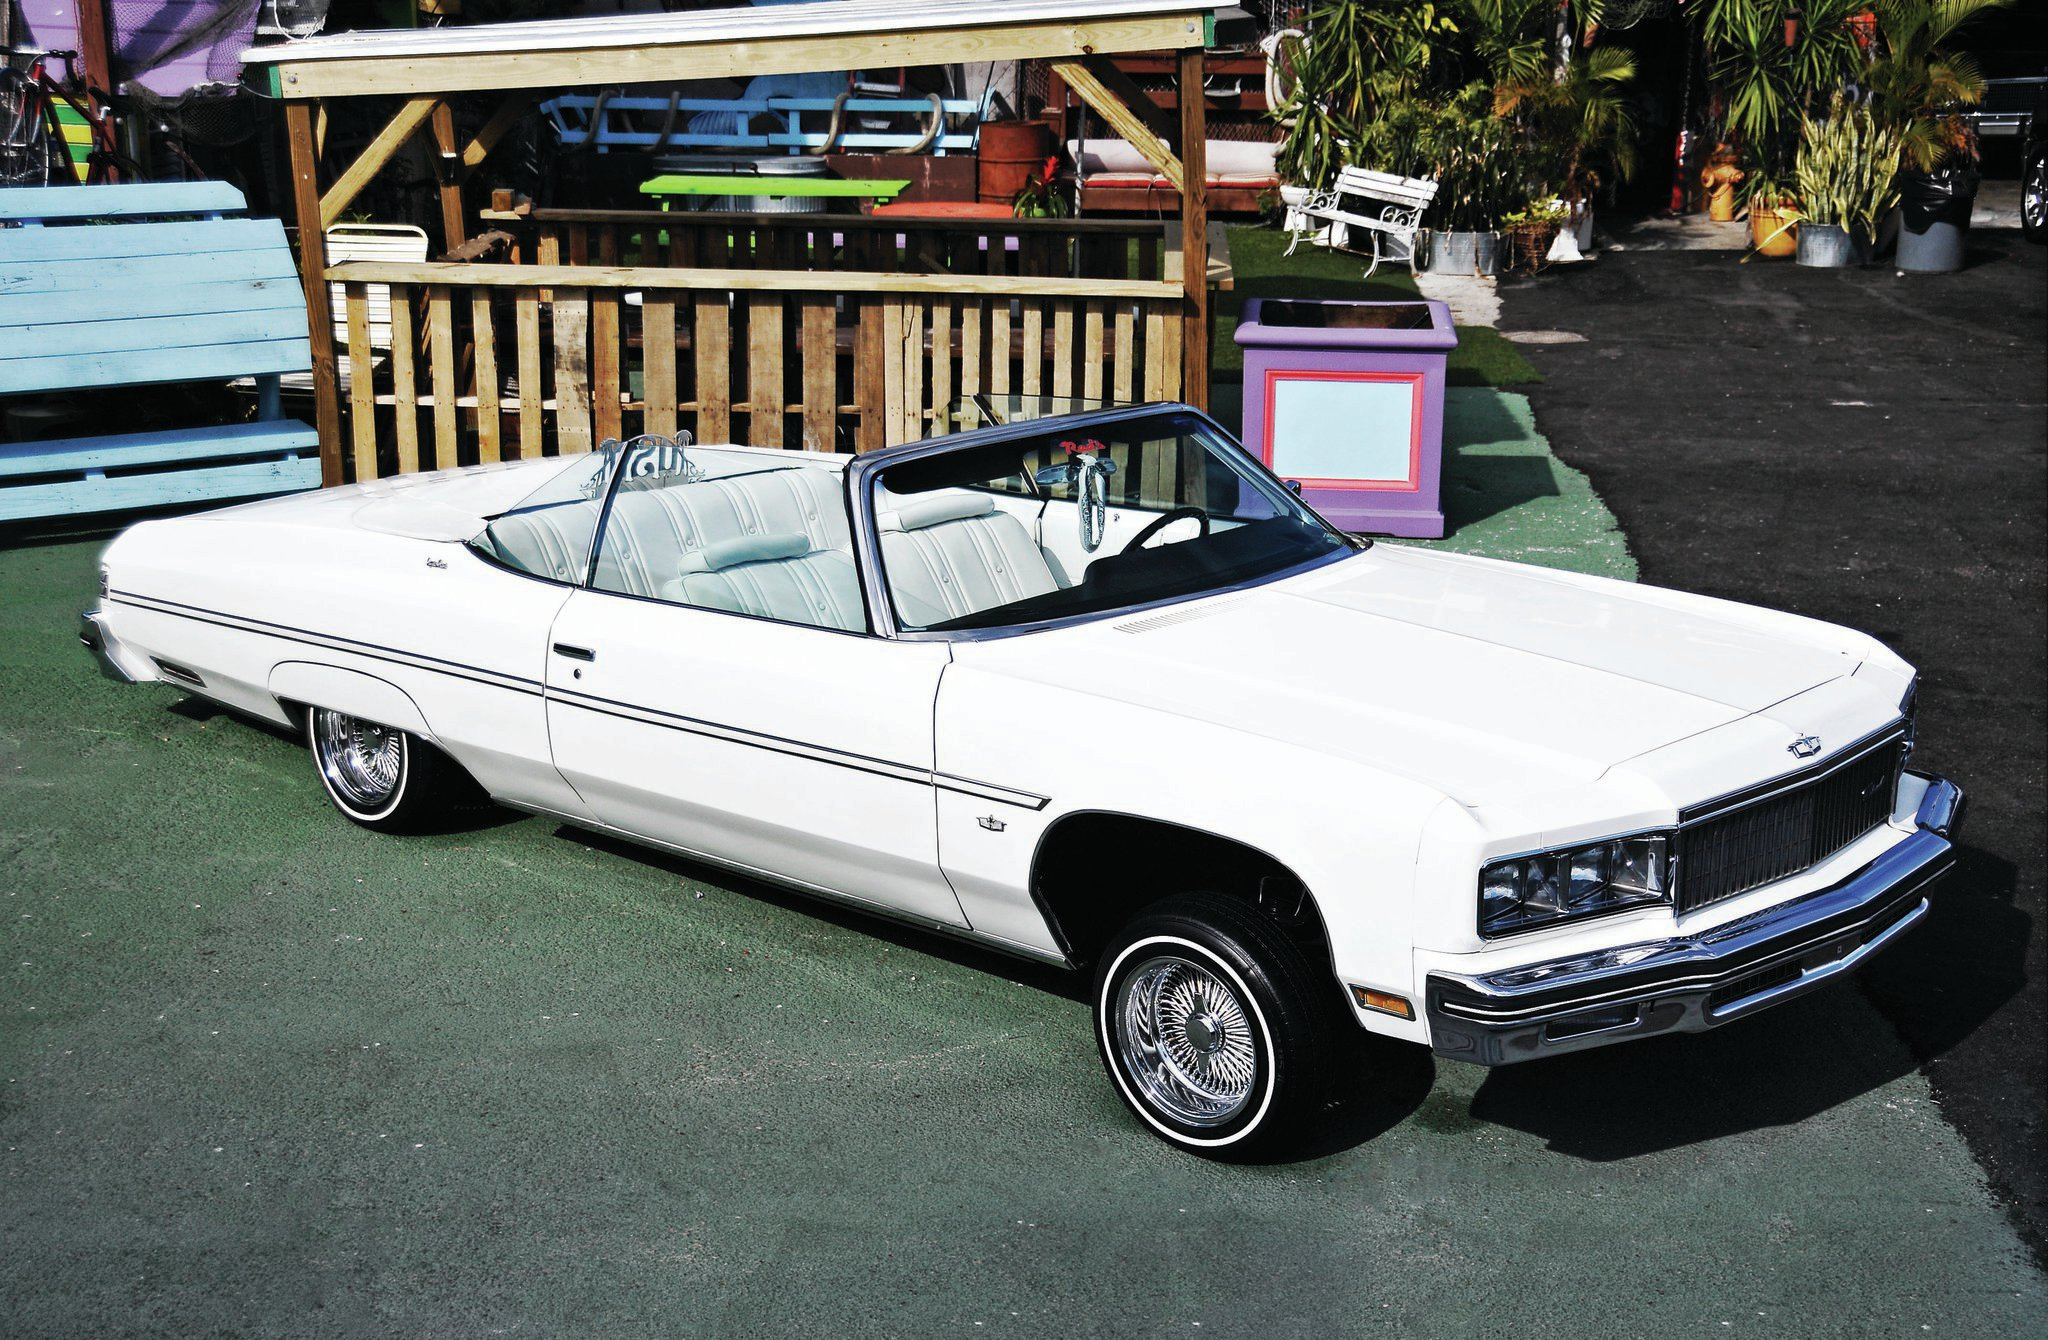 Lowrider Miami >> 1975 Chevrolet Caprice Classic - Great White '75